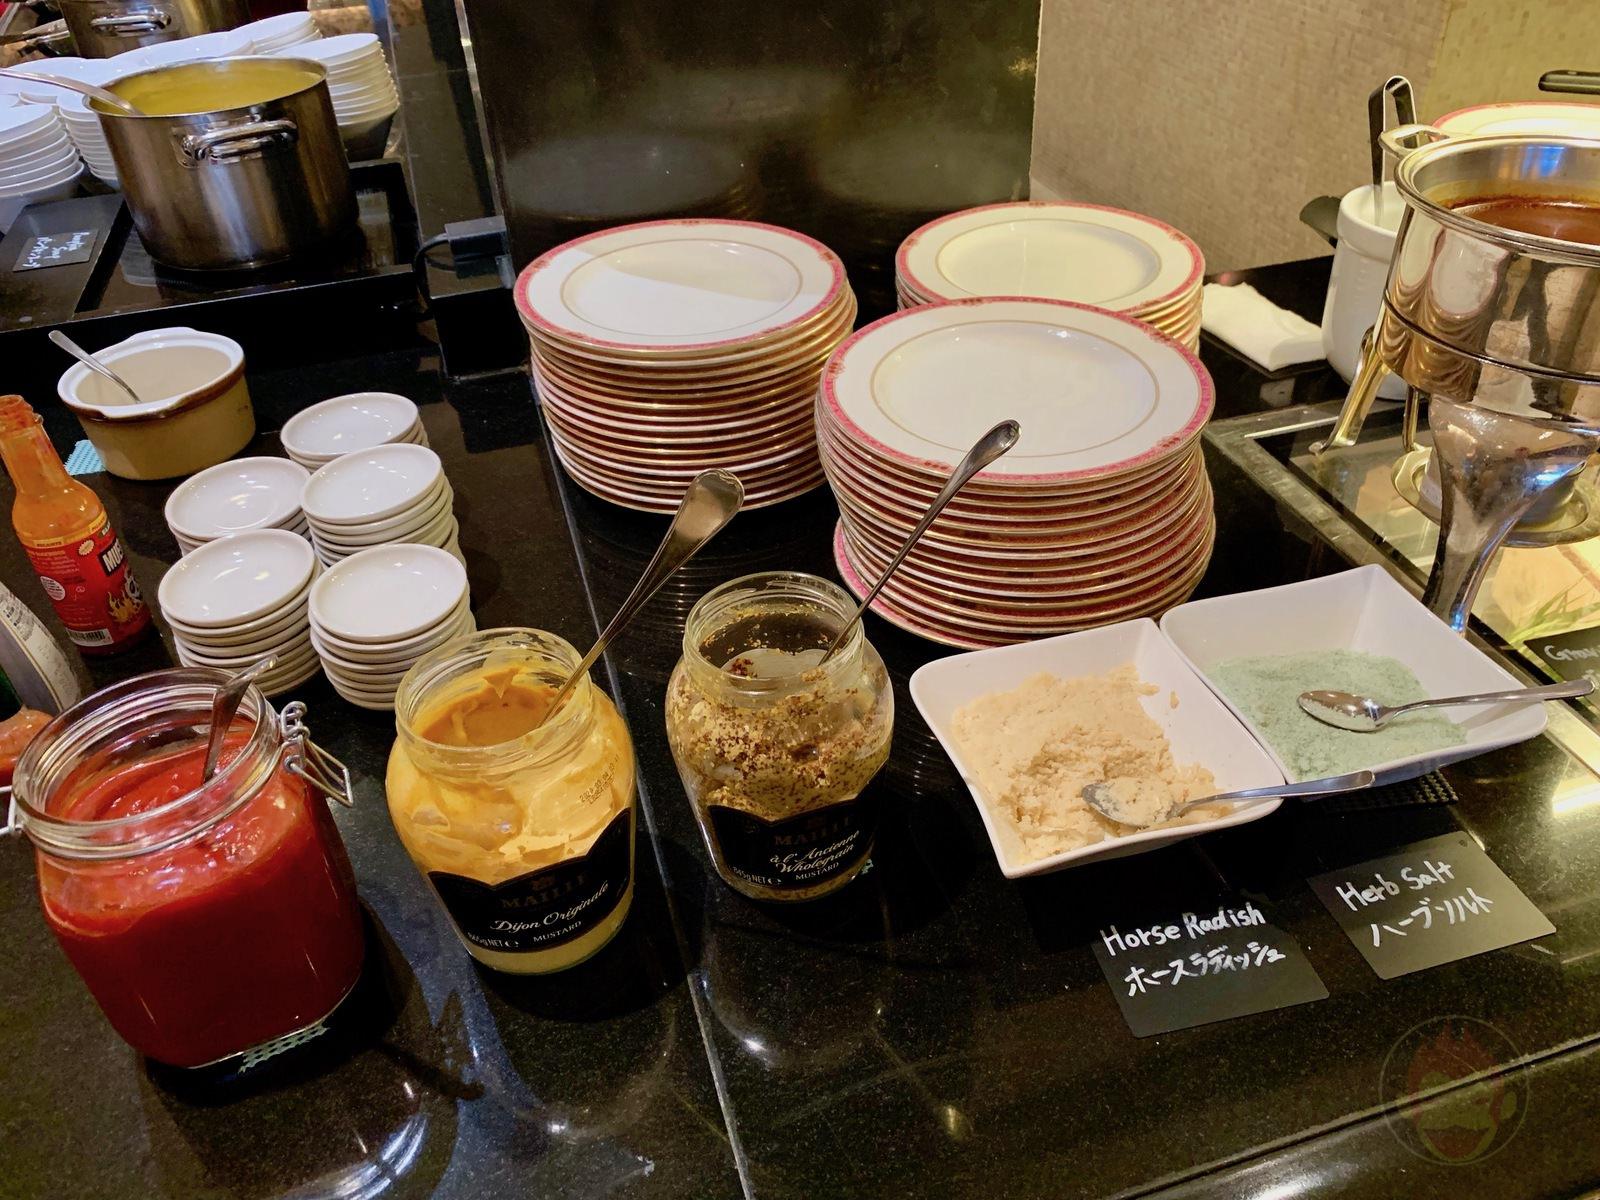 Westin tokyo theterrace lunch buffet 15